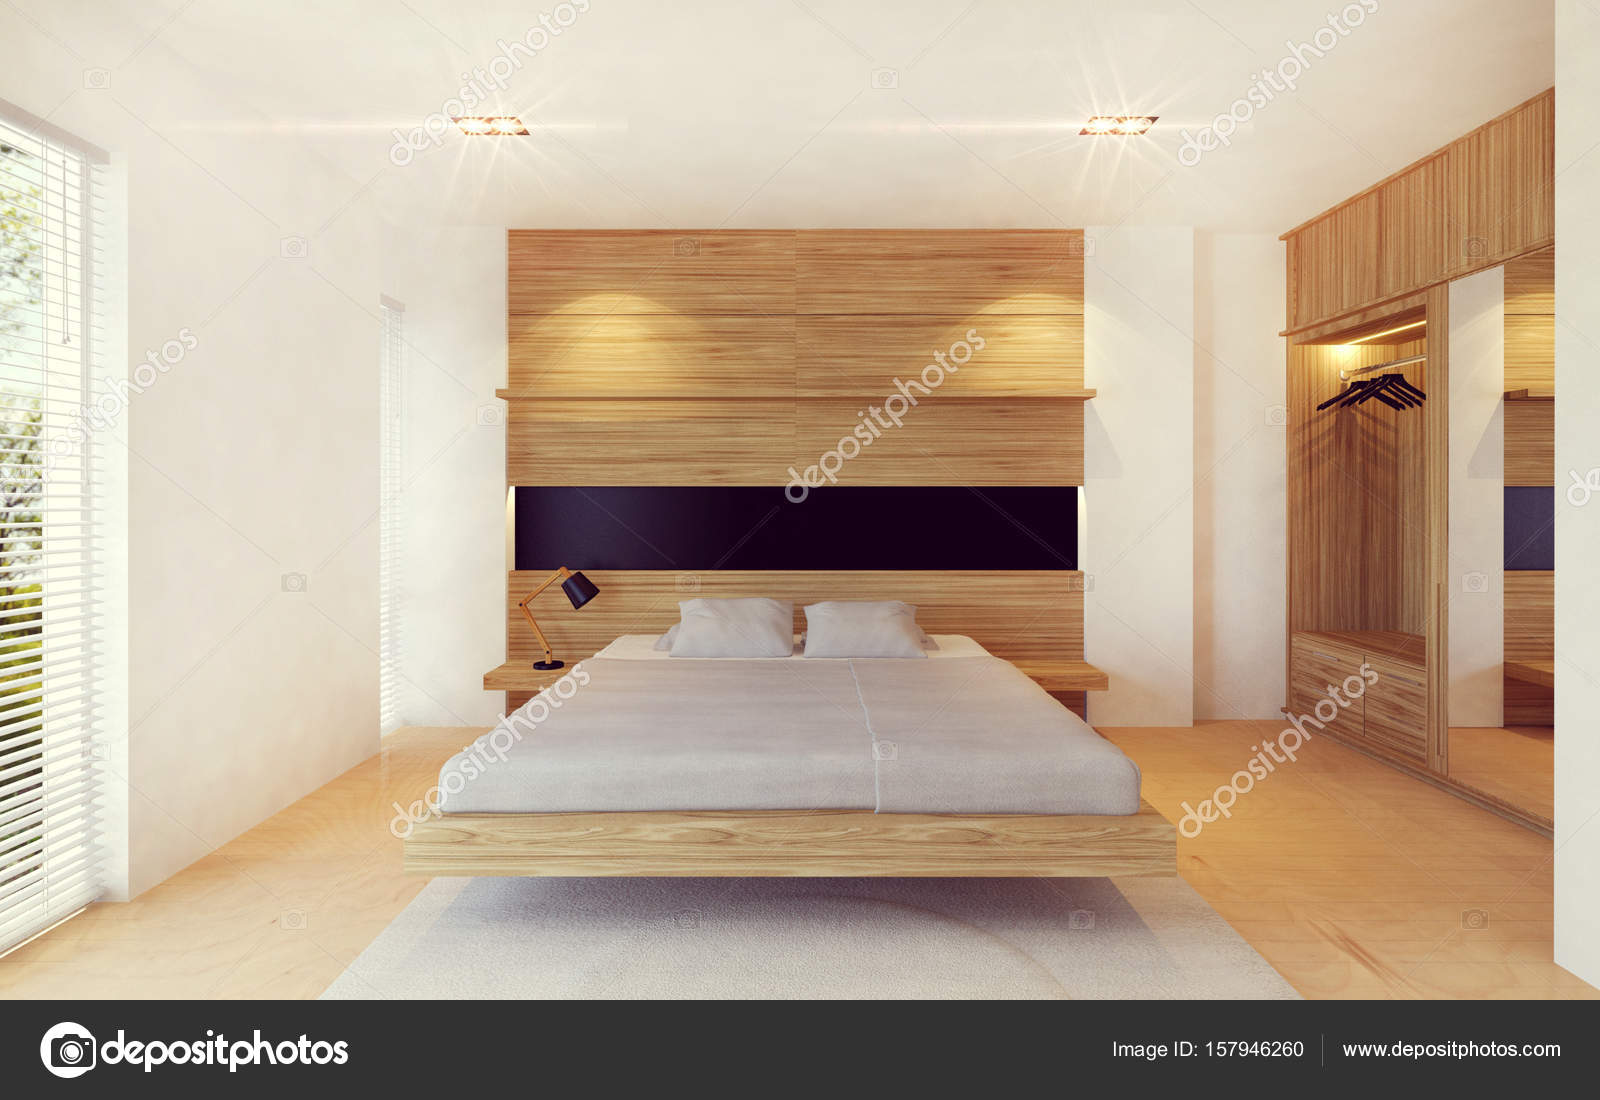 Moderne Schlafzimmer Innenraum In Holz Dekoration, 3D Rendering U2014 Stockfoto